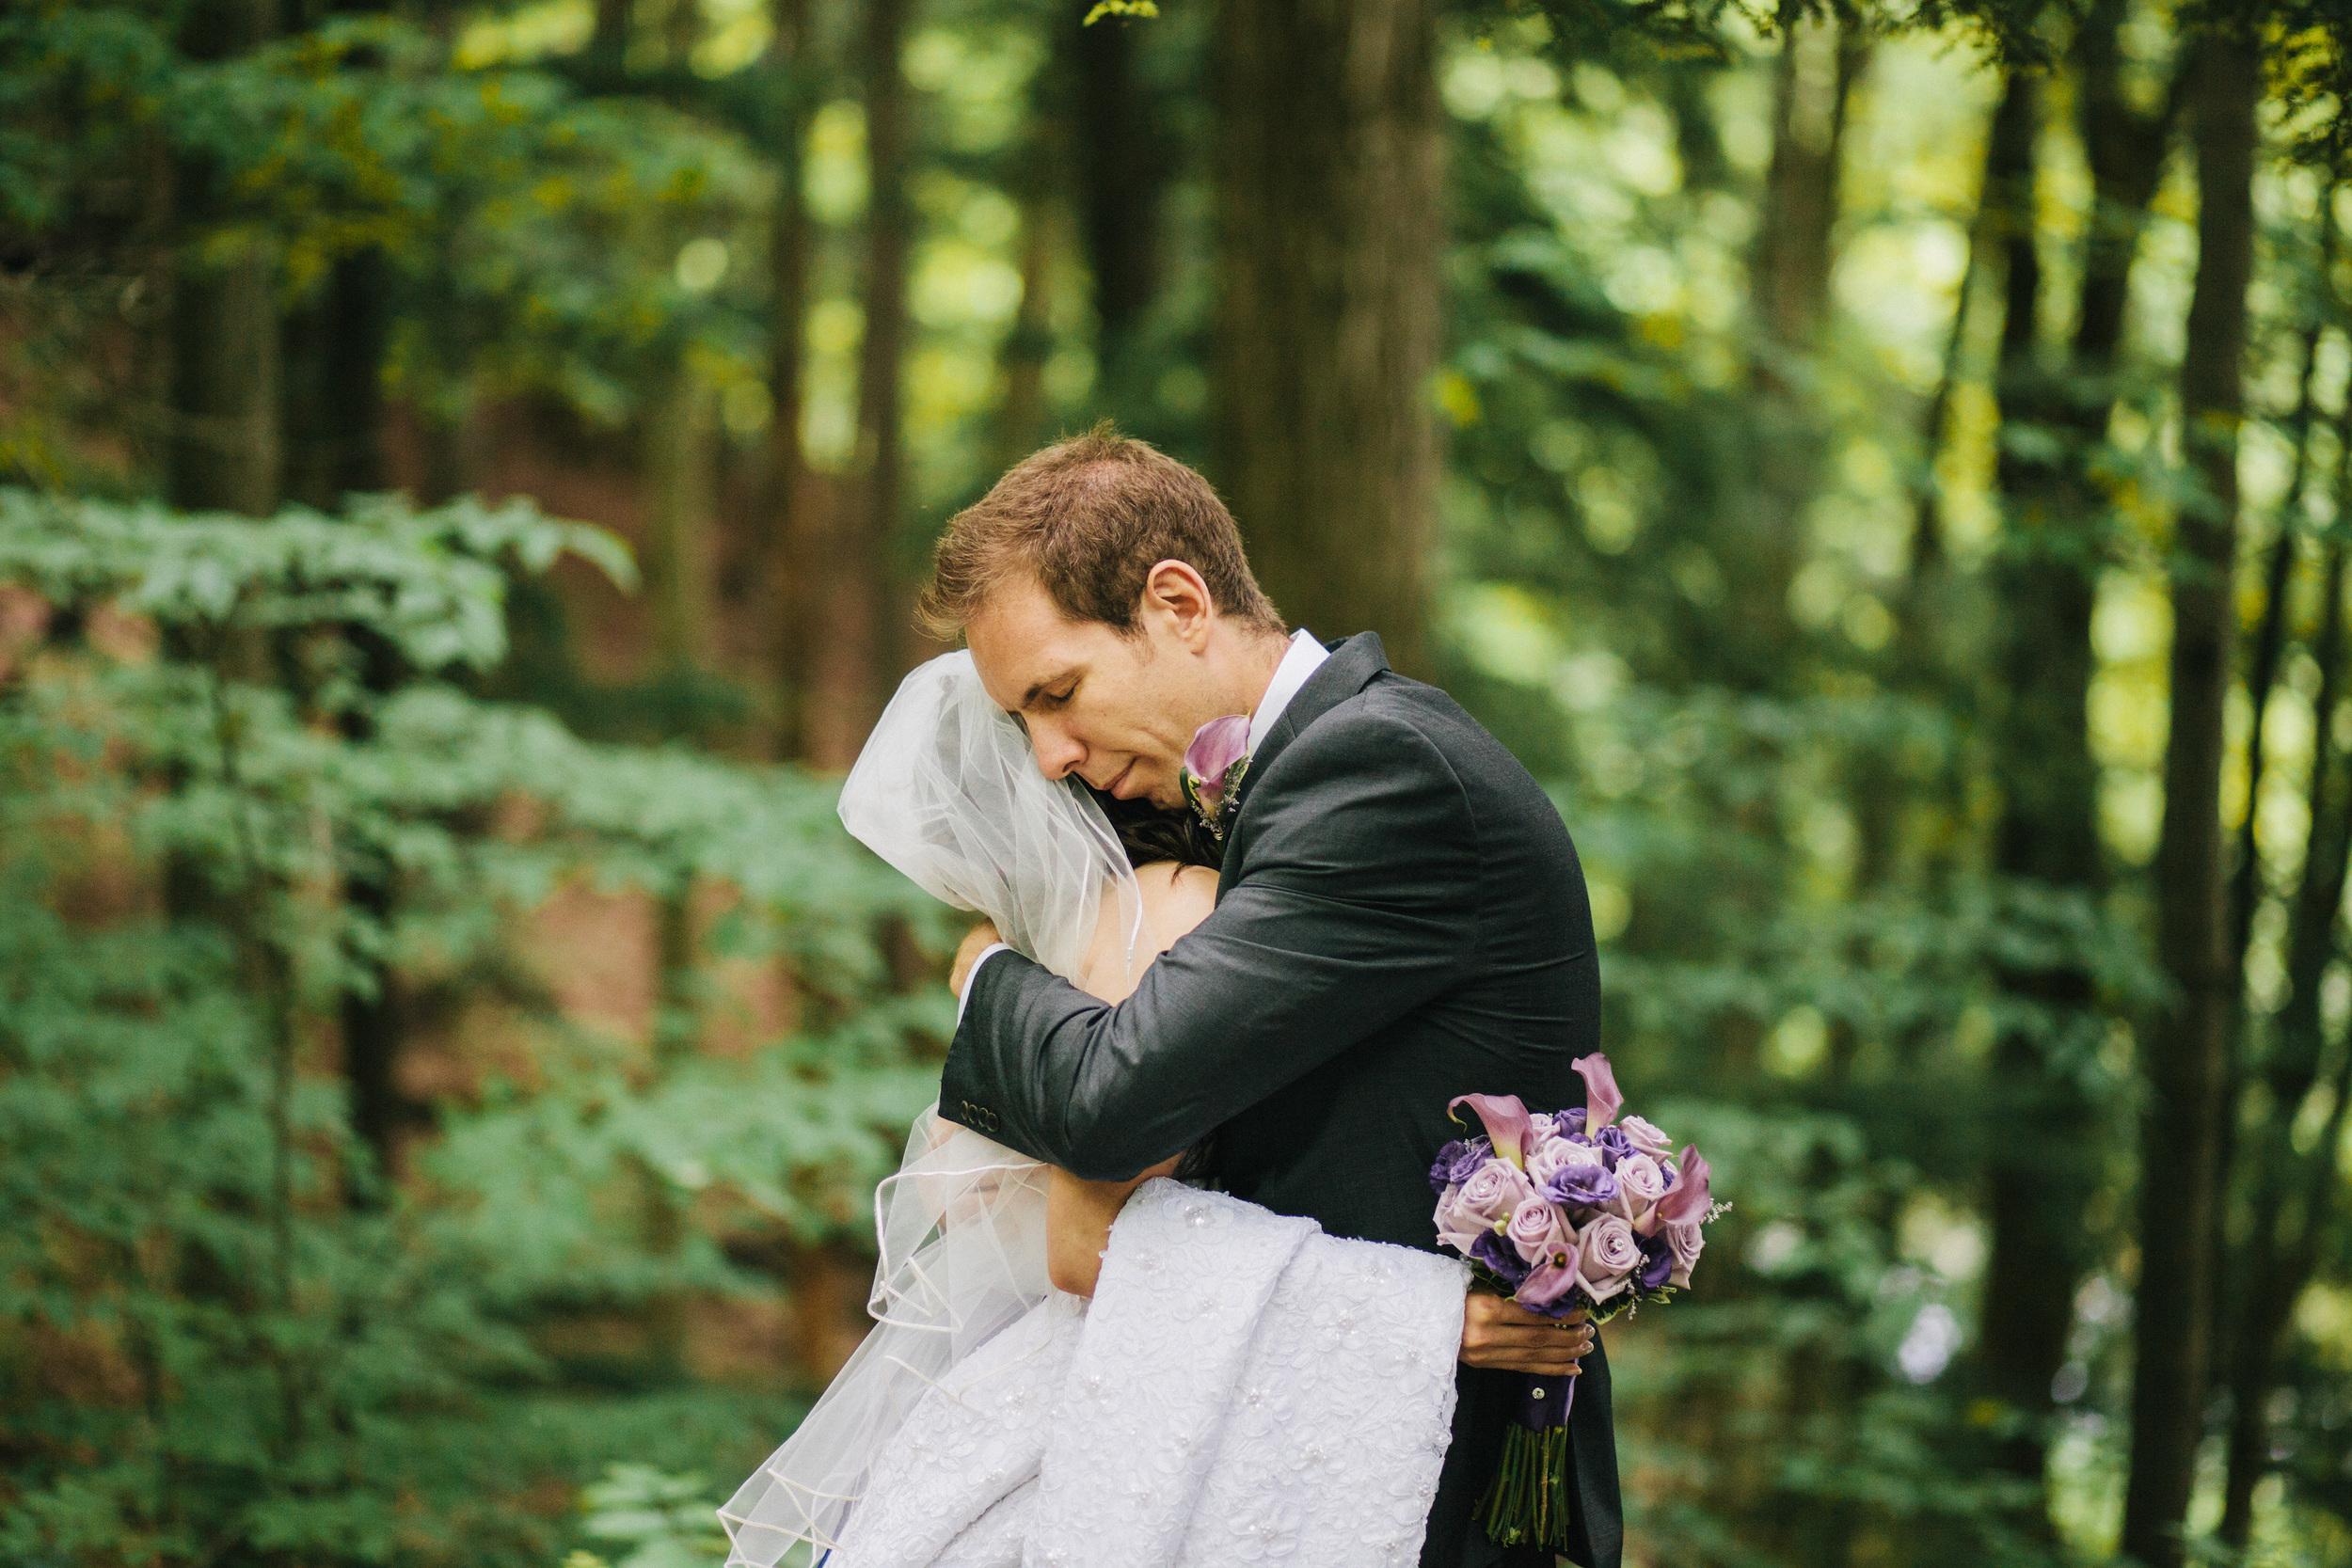 michael-rousseau-photography-kortwright-centre-wedding019.jpg